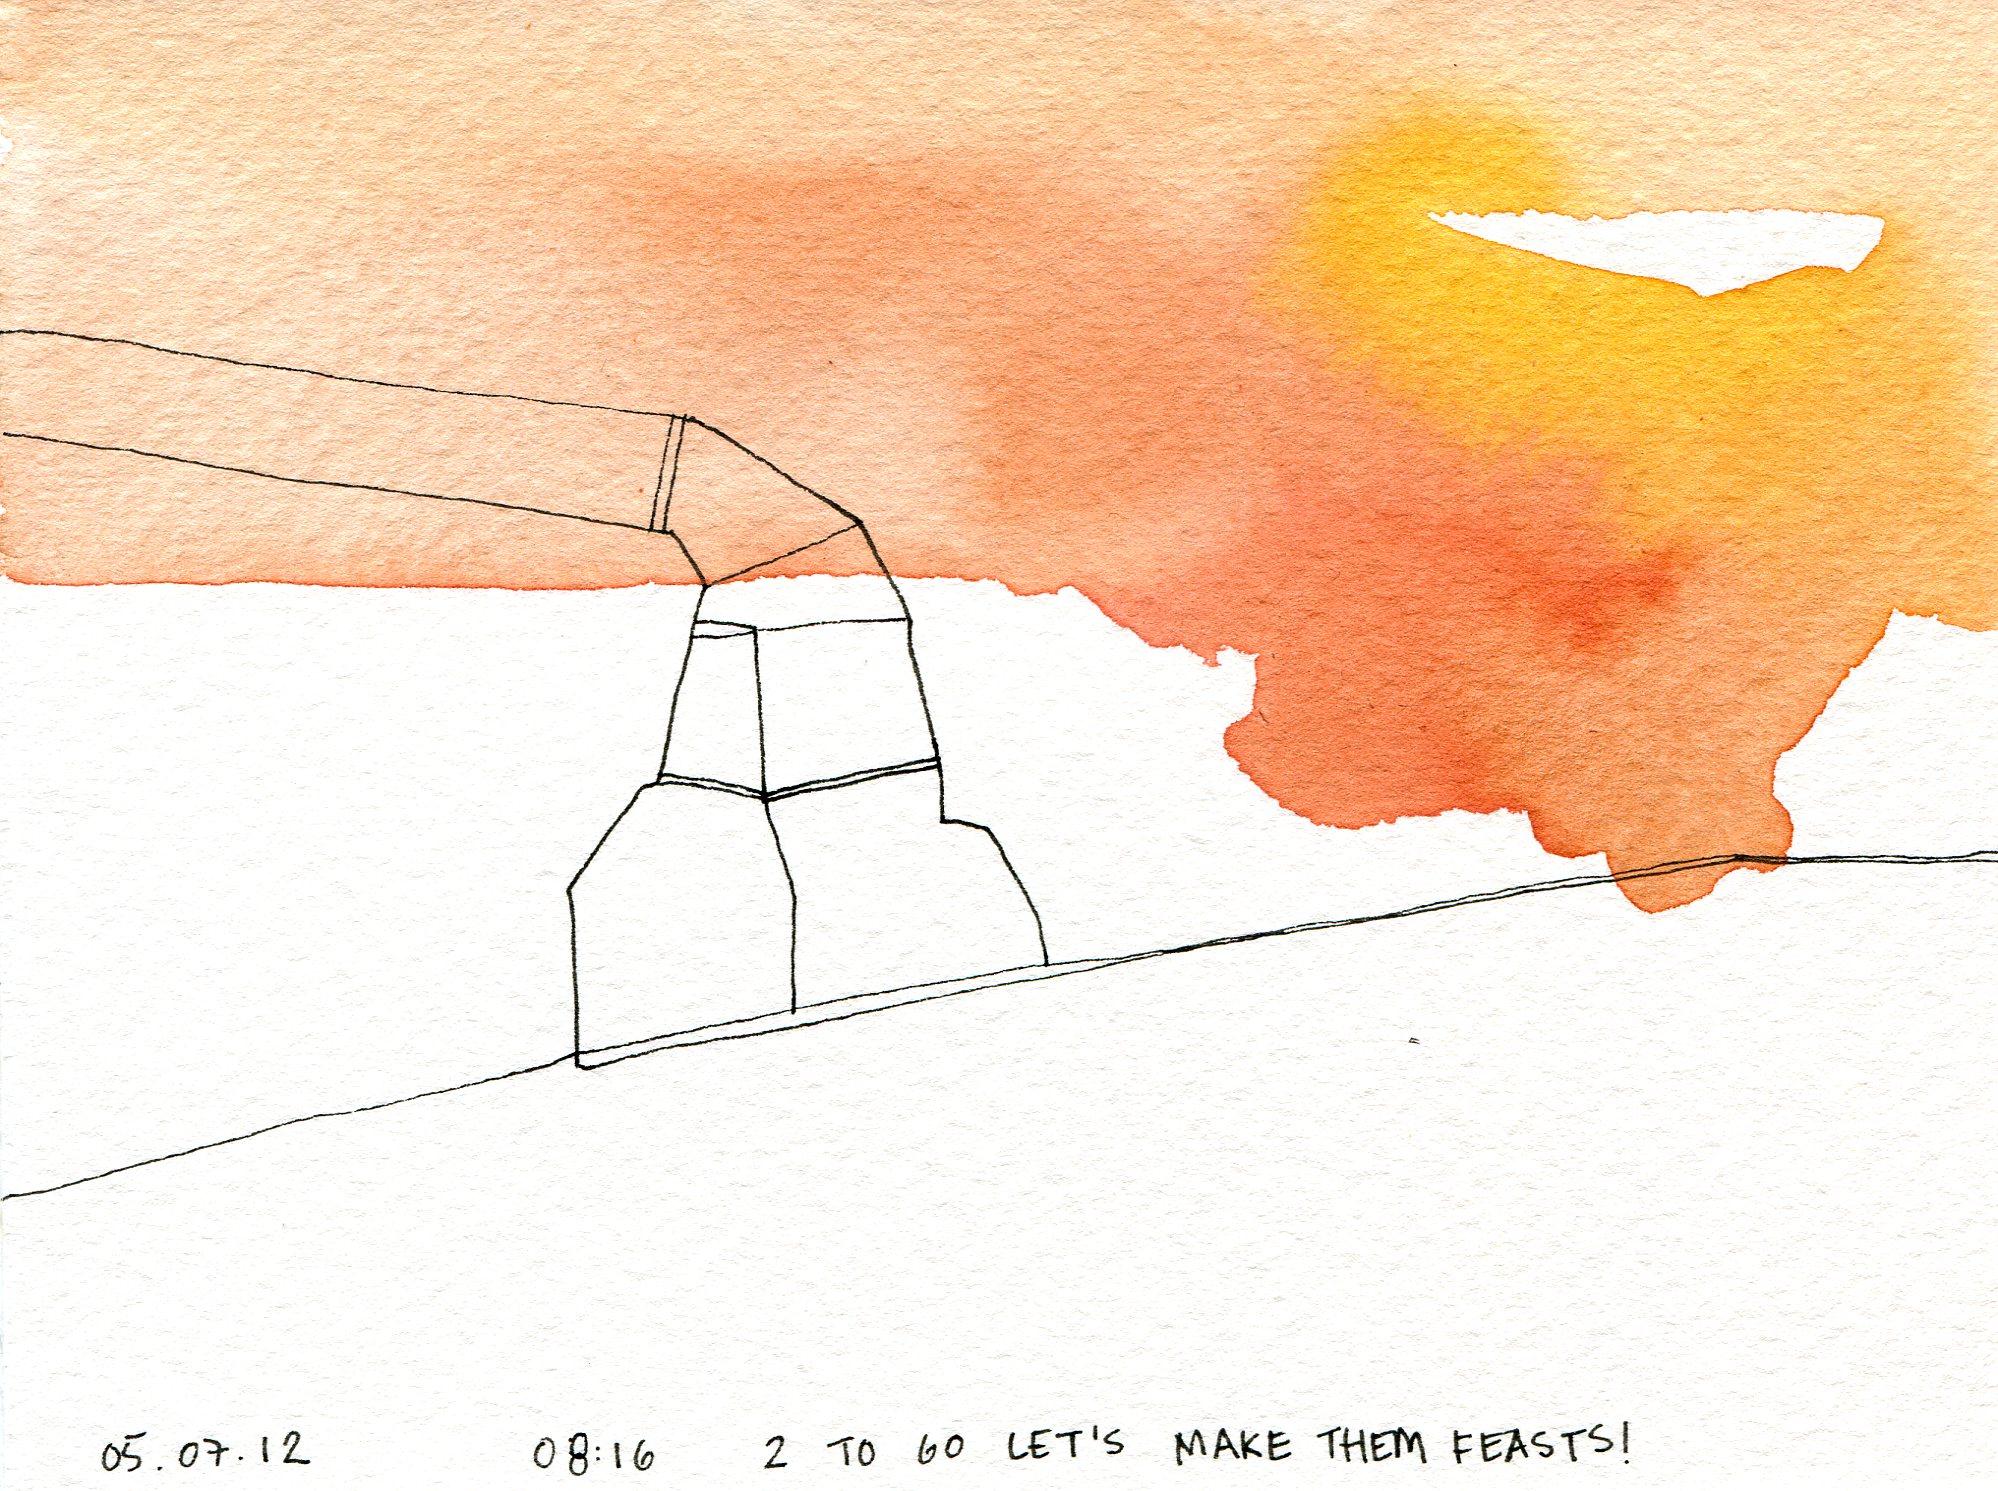 2012-05-12 drawing002.jpg